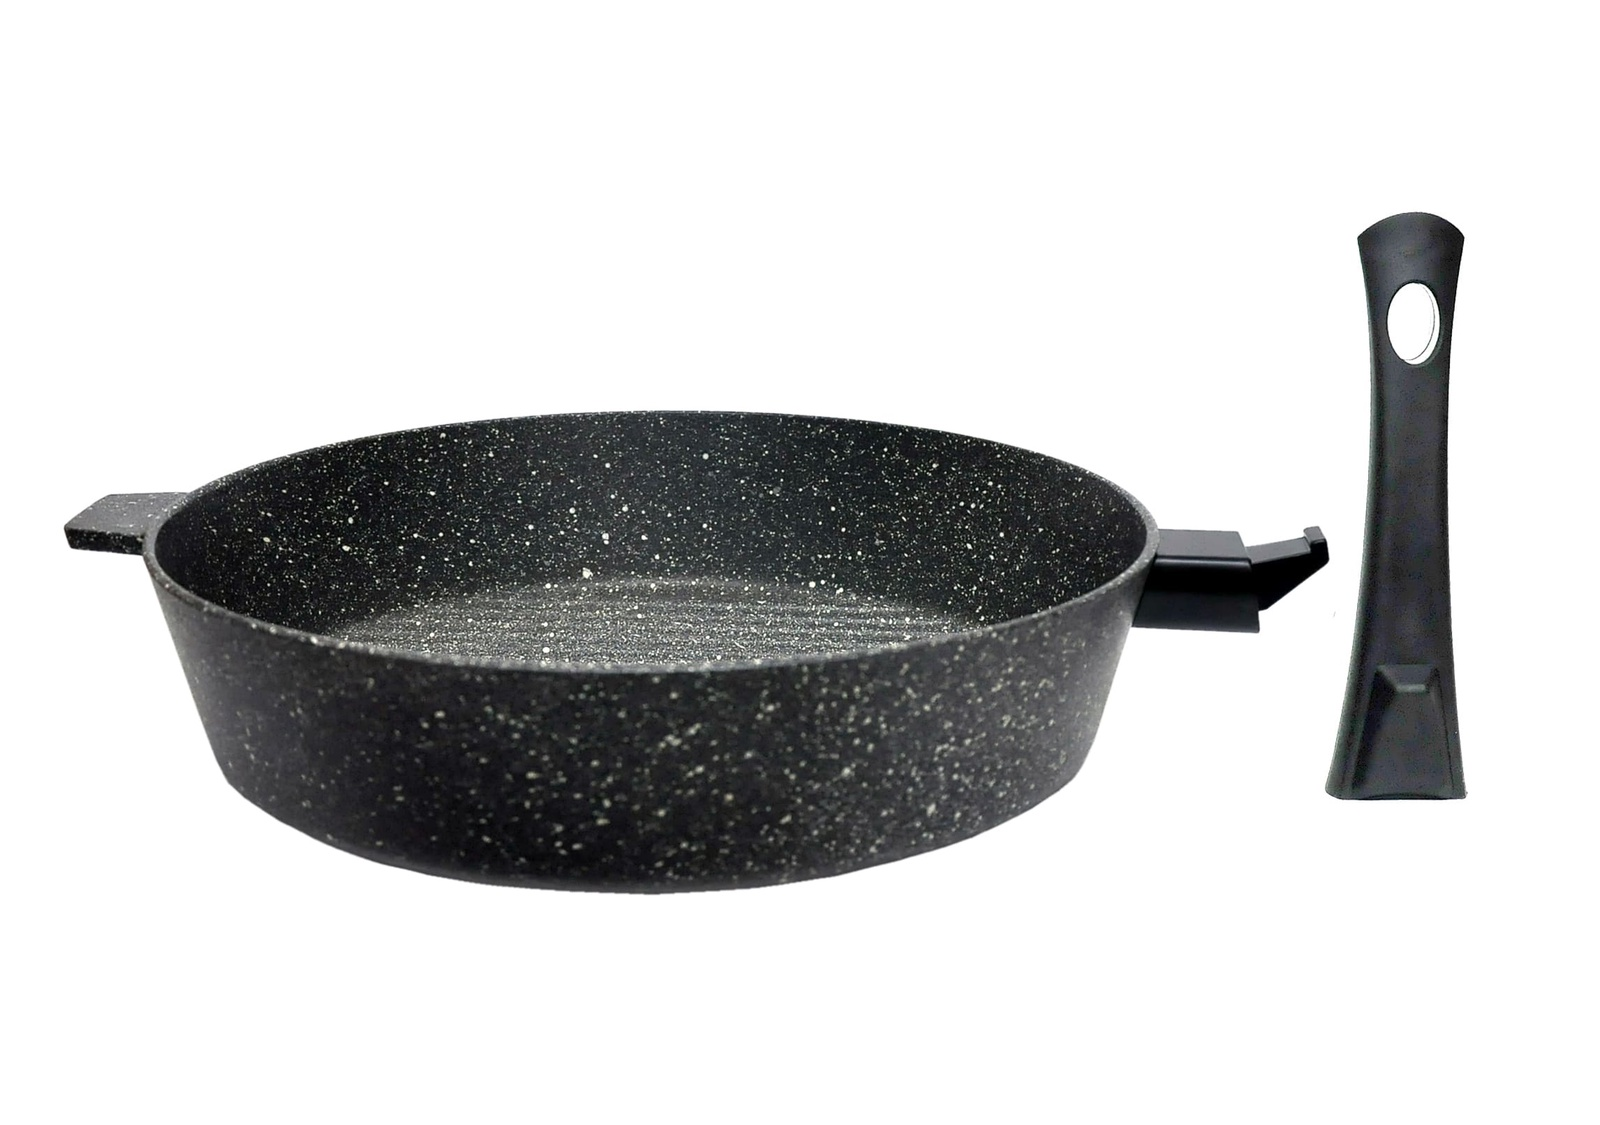 Сковорода алюминиевая Алита Гриль со съемной ручкой, 19502, мрамор, 26 х 6,0 х 0,6 см сковорода алюминиевая алита гриль со съемной ручкой 19702 черный мрамор 28 х 6 5 х 0 6 см